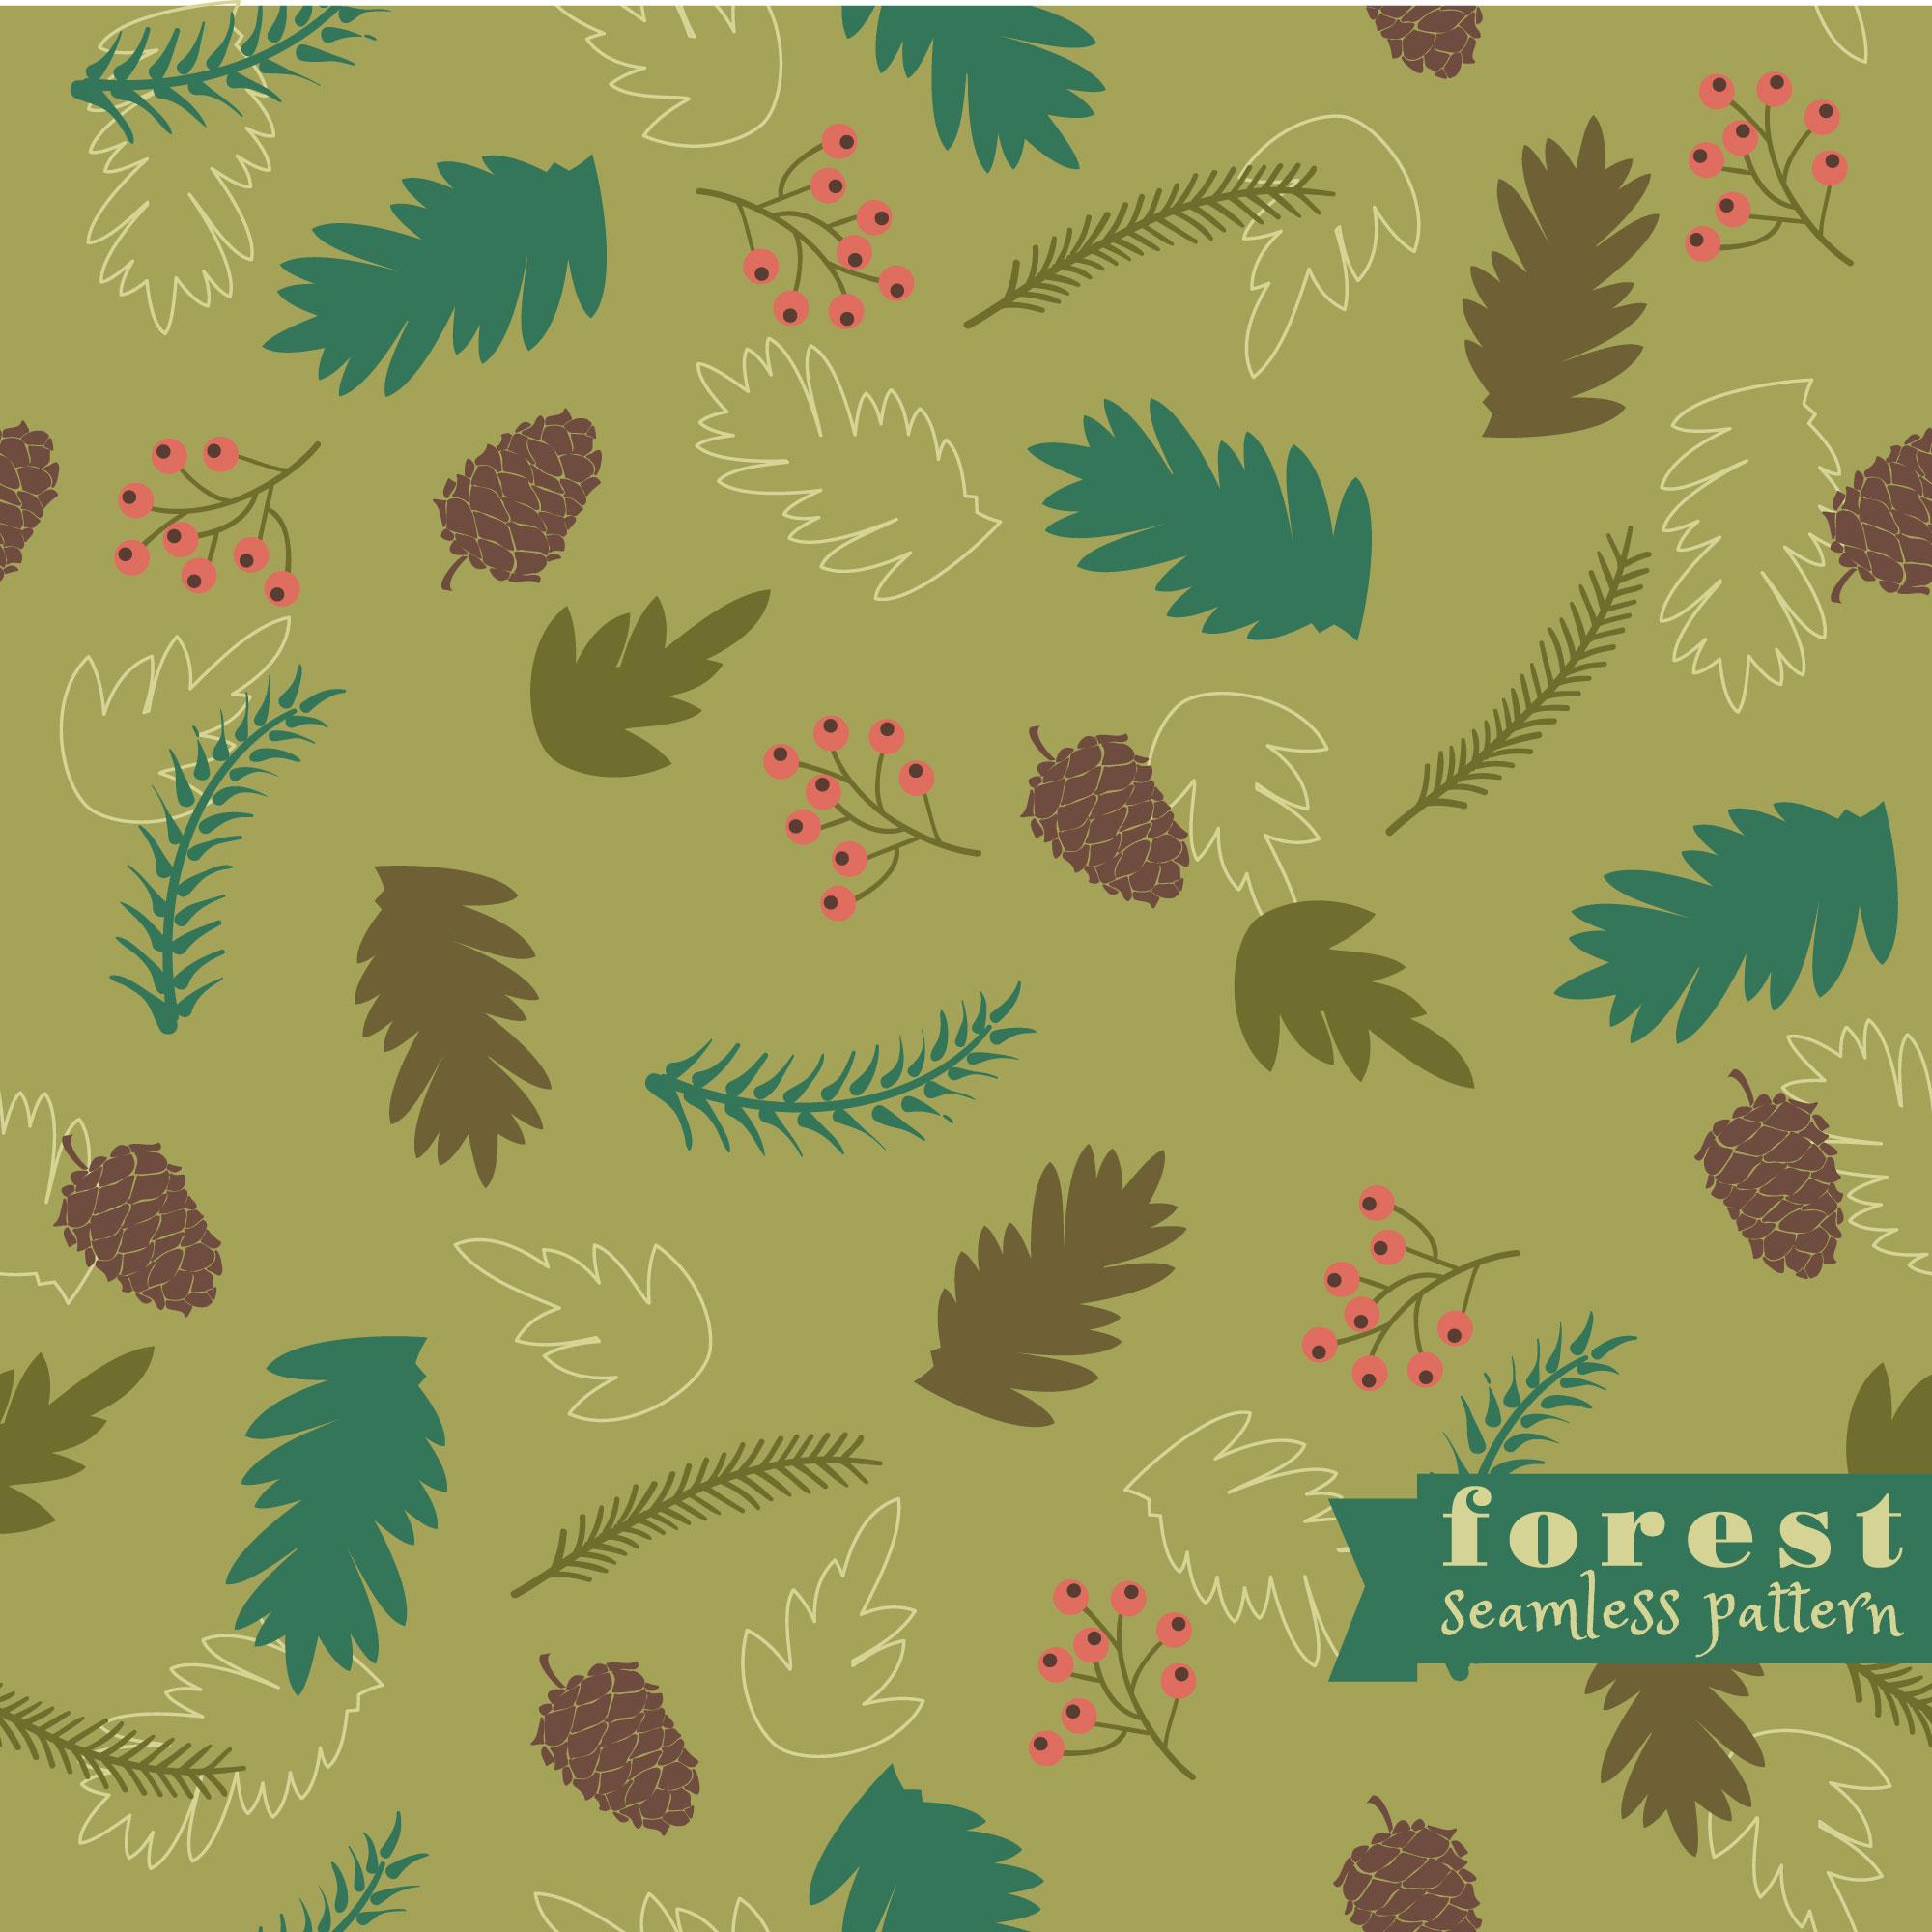 Forest seamless pattern Photoshop brush